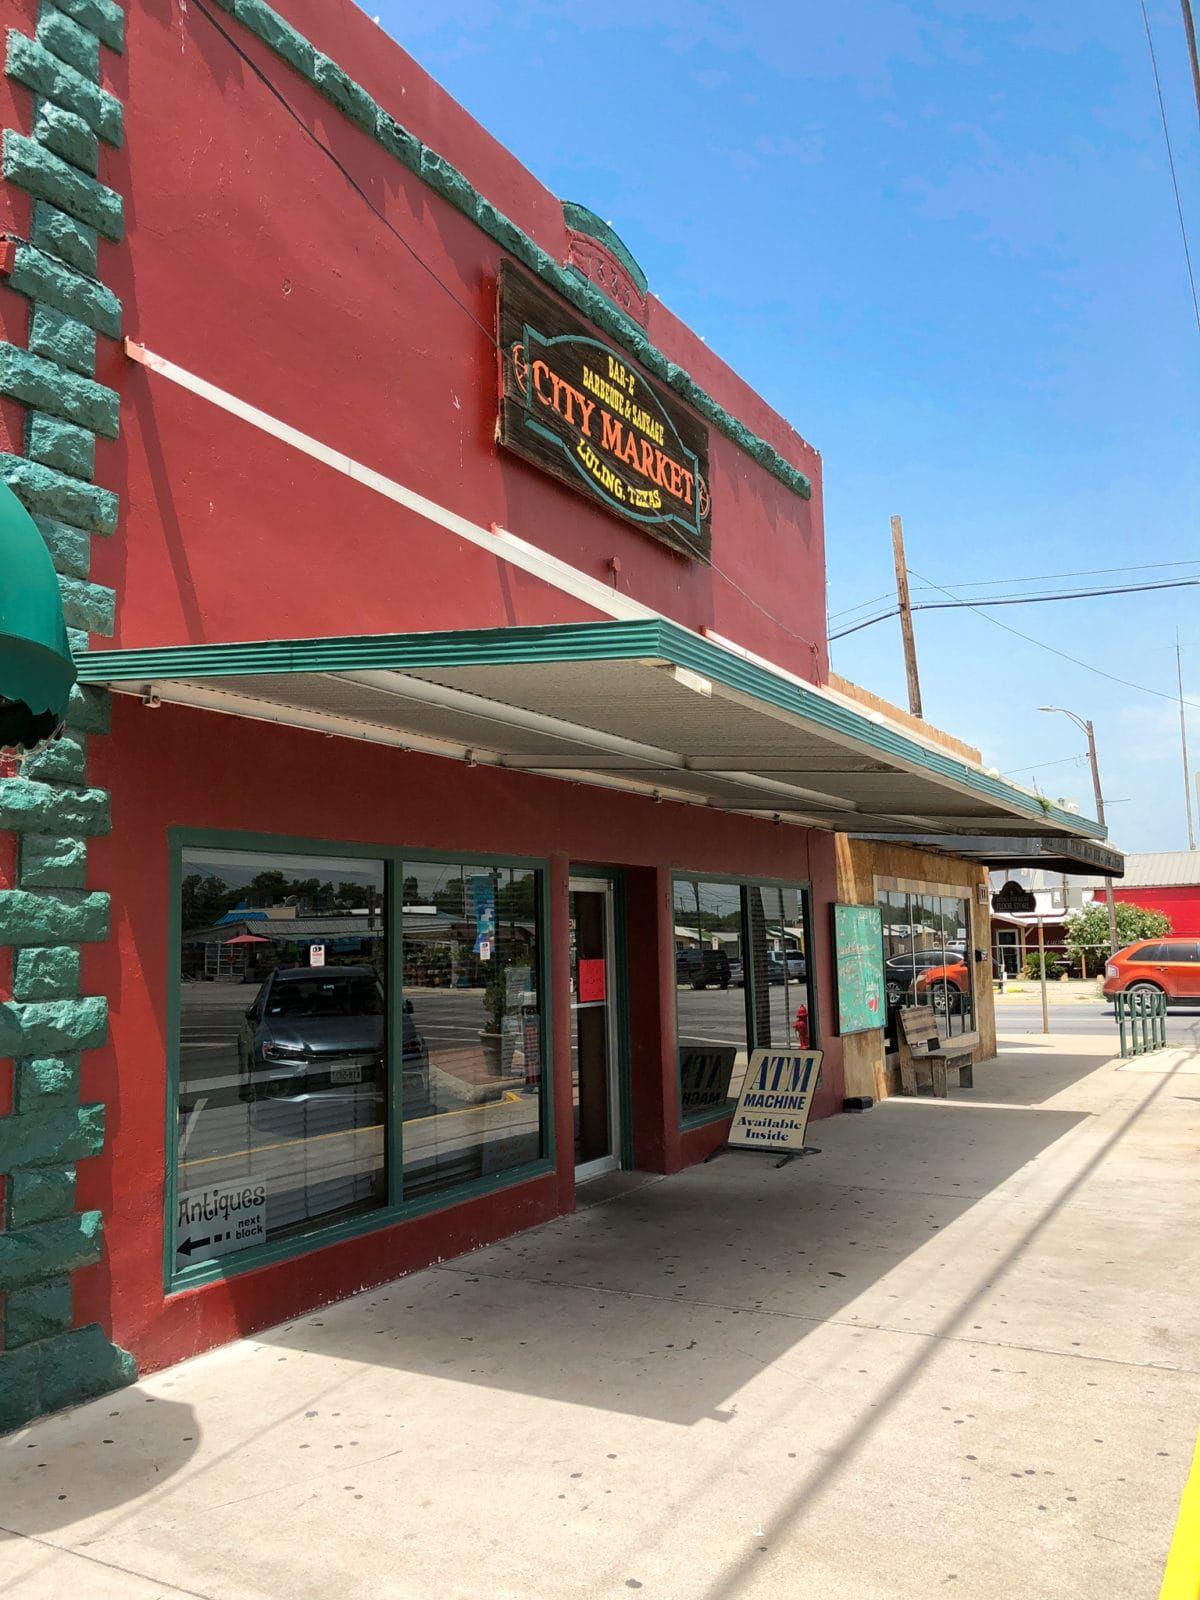 6 Places You Must Stop Between Houston To San Antonio San Antonio Road Trip City Market Soovite osta lennupiletit linnast houston linna san antonio madalaima hinna eest? 6 places you must stop between houston